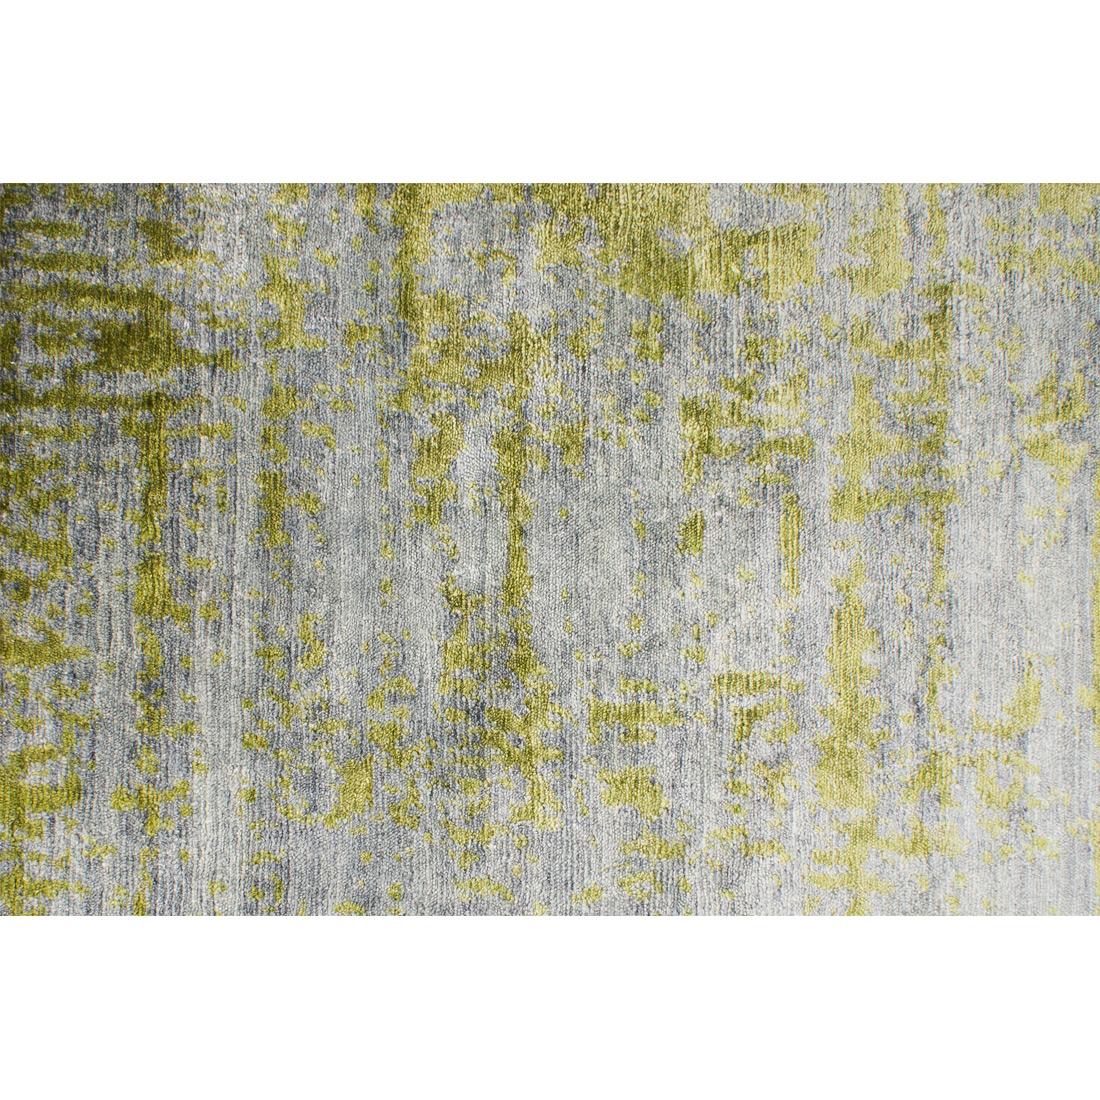 Vloerkleed Xilento Bamboo Grey Green | 240 x 340 cm